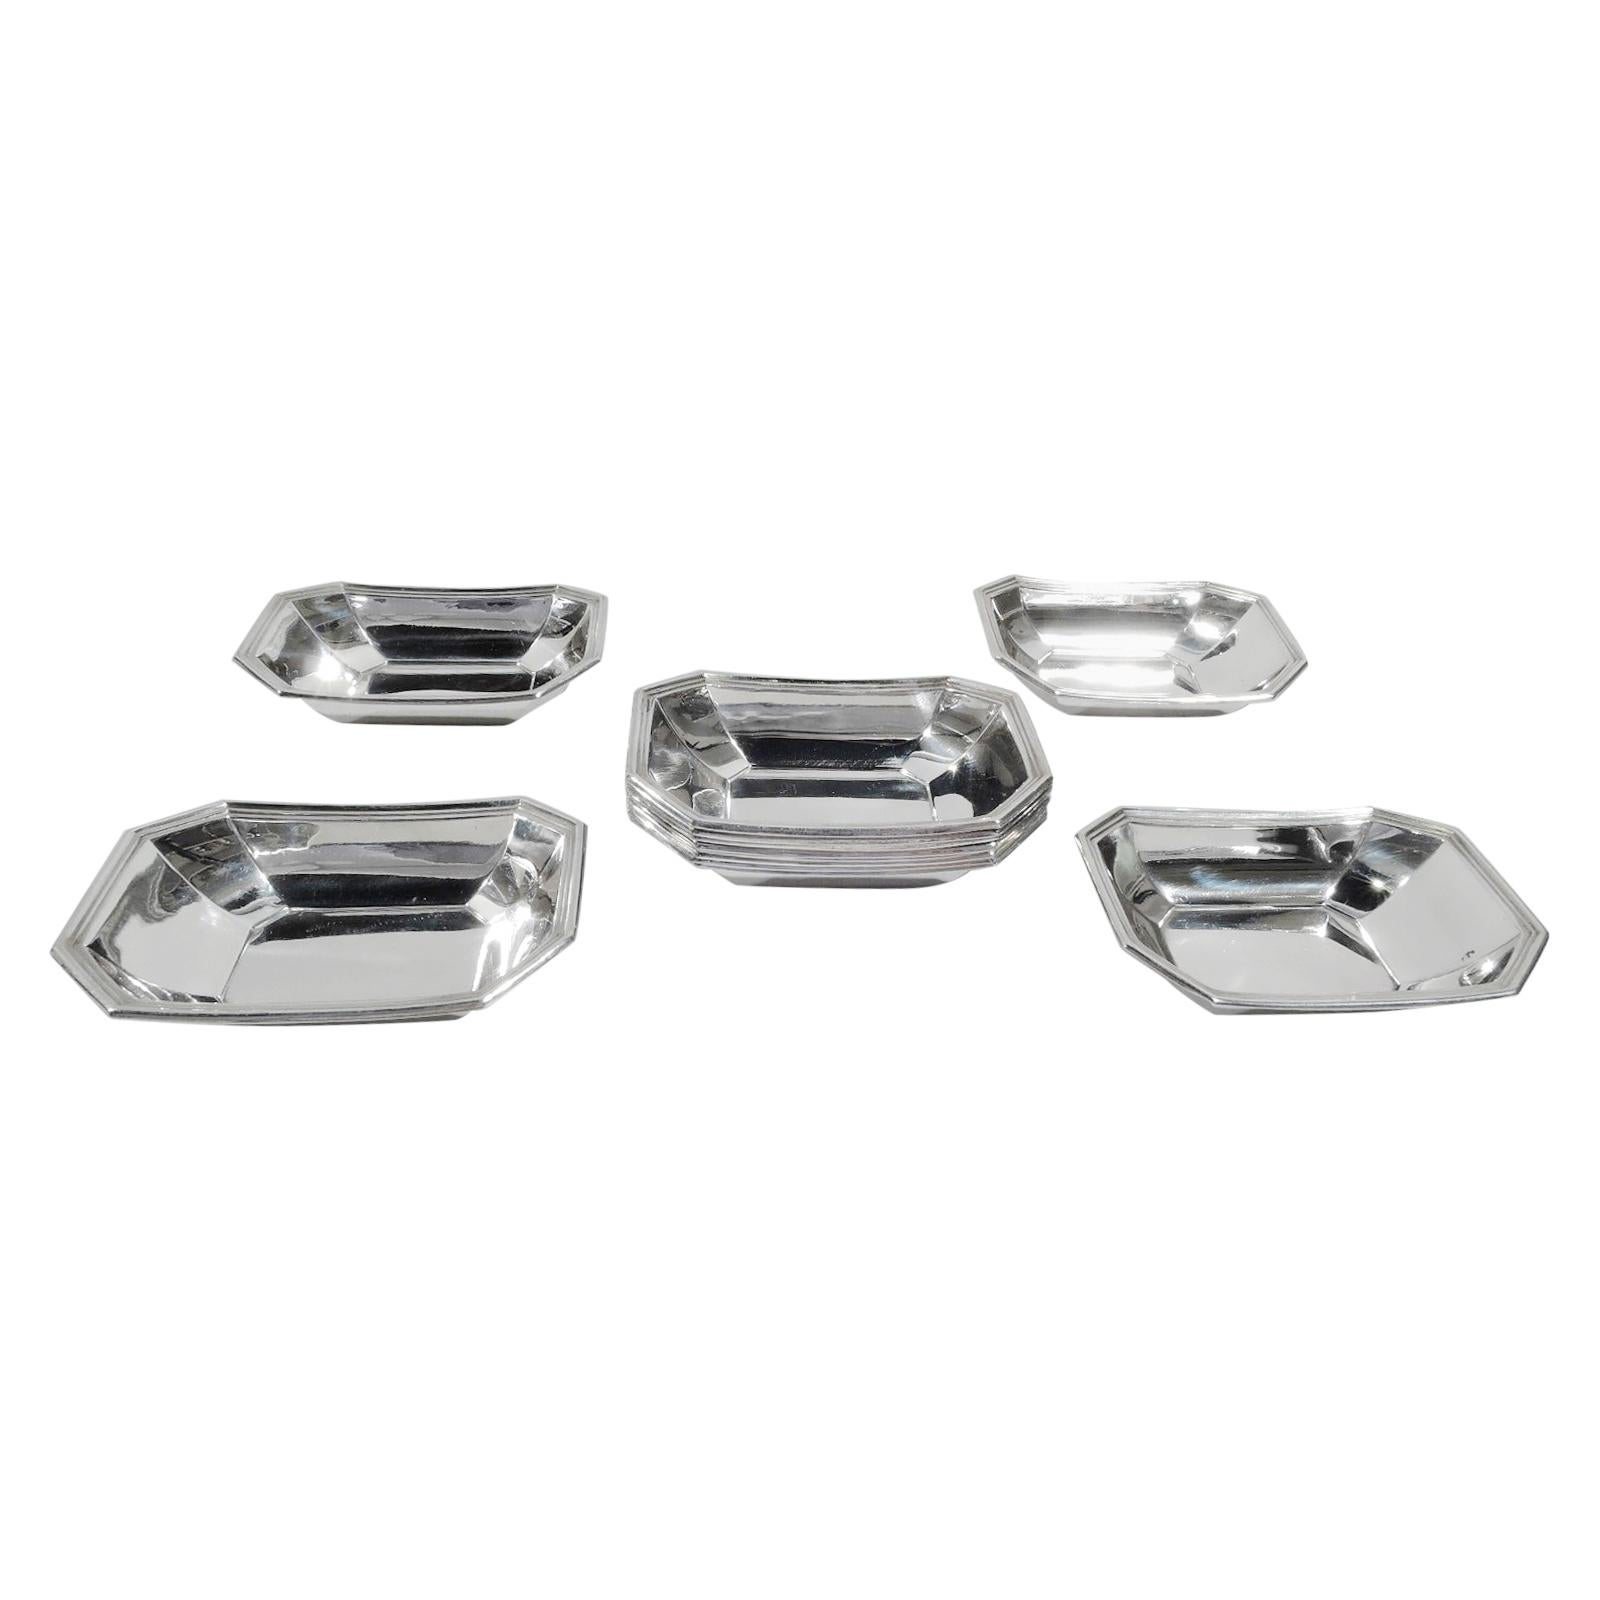 Set of 12 Gorham Fairfax Art Deco Sterling Silver Nut Dishes